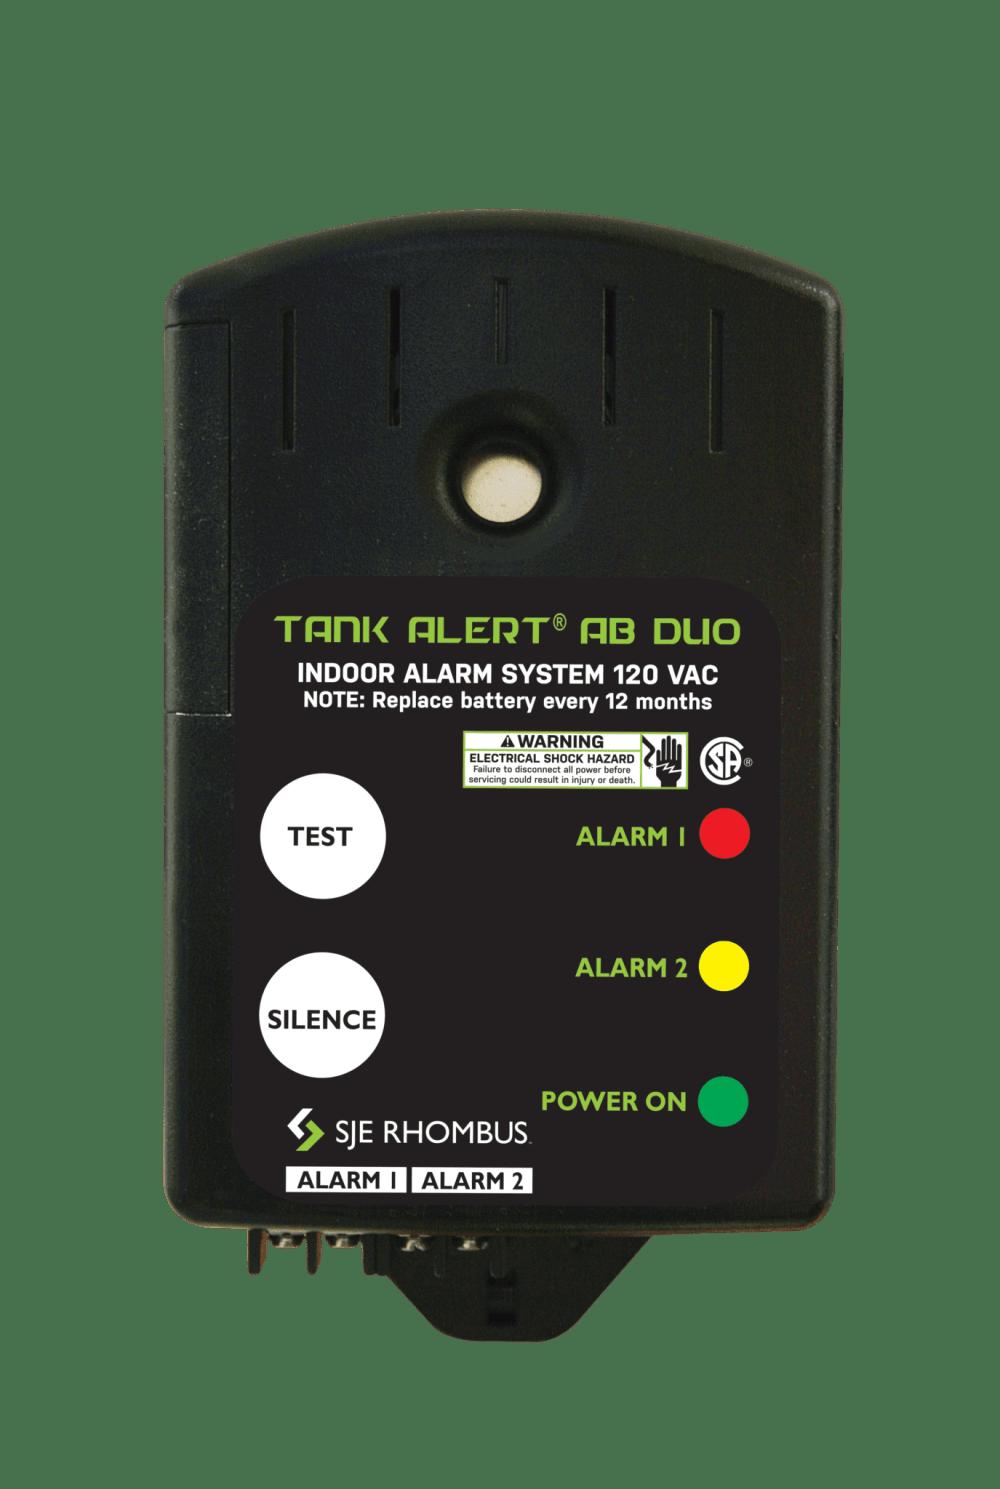 medium resolution of tank alert ab duo